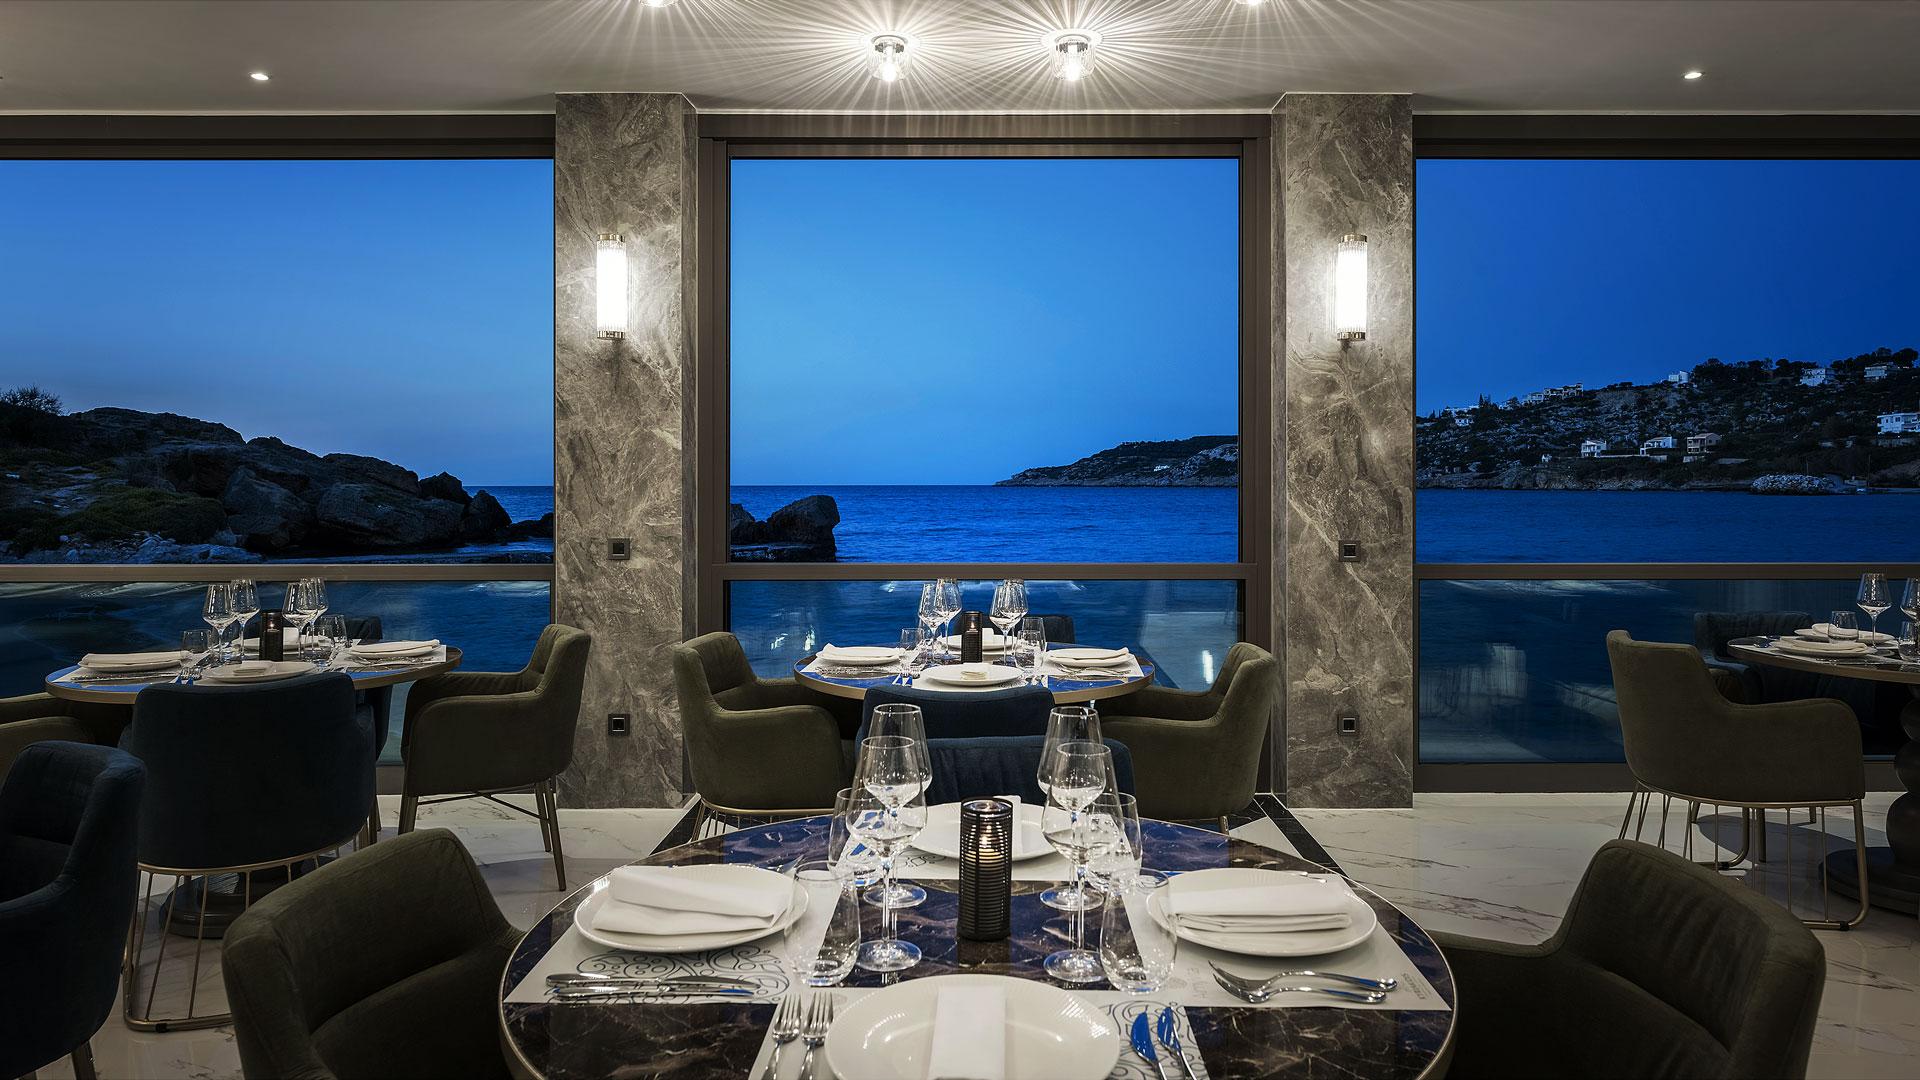 Luxury Restaurants in Chania- Almyvita Luxury Restaurant, Almyrida, Chania